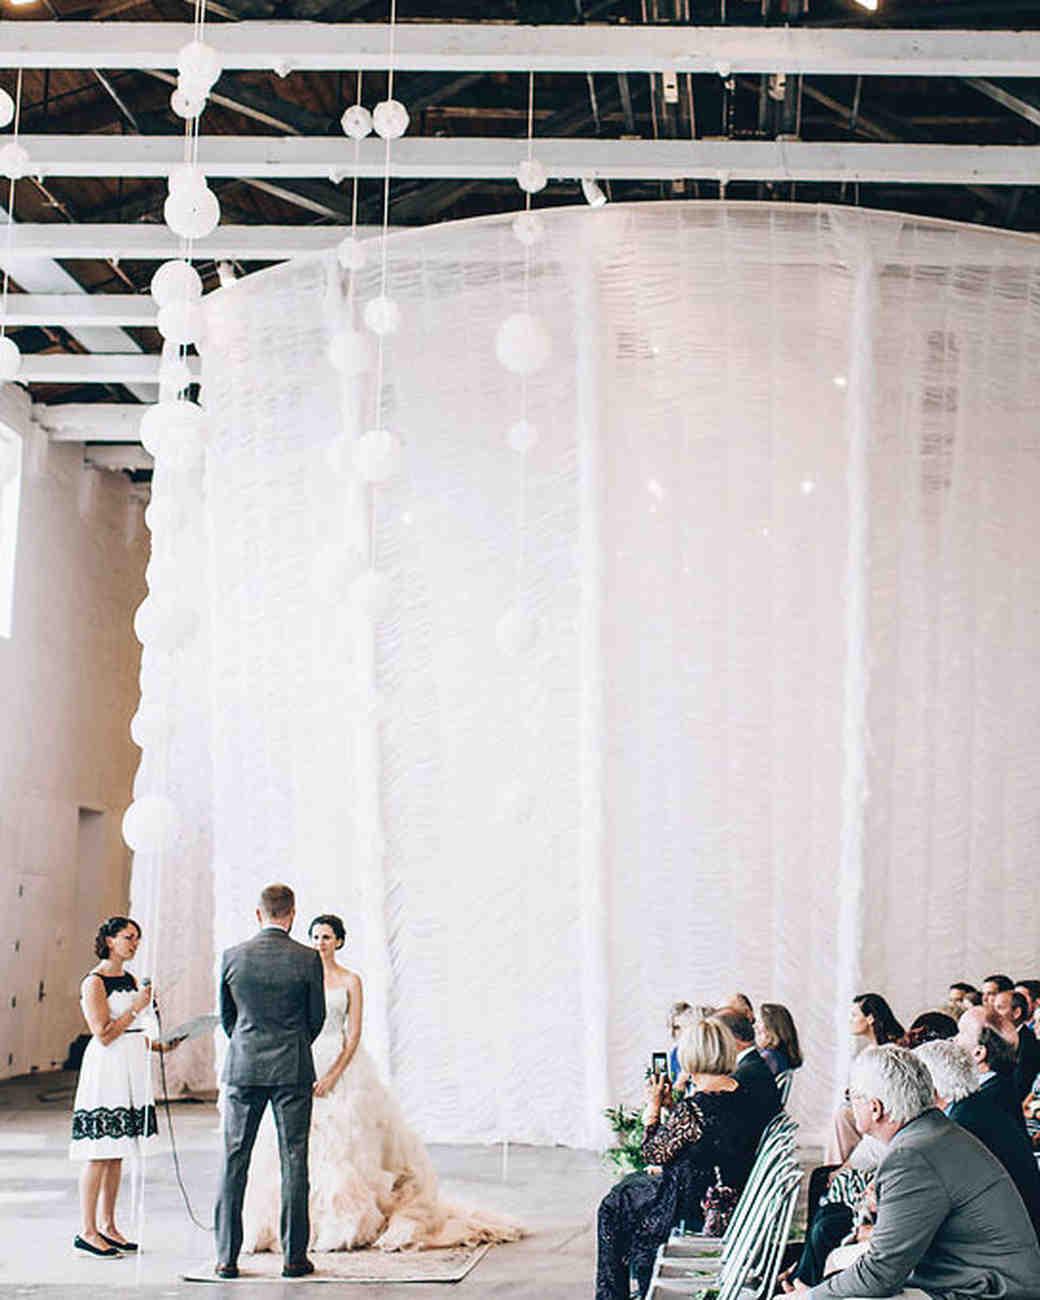 moira-dustin-real-wedding-ceremony-at-the-altar.jpg